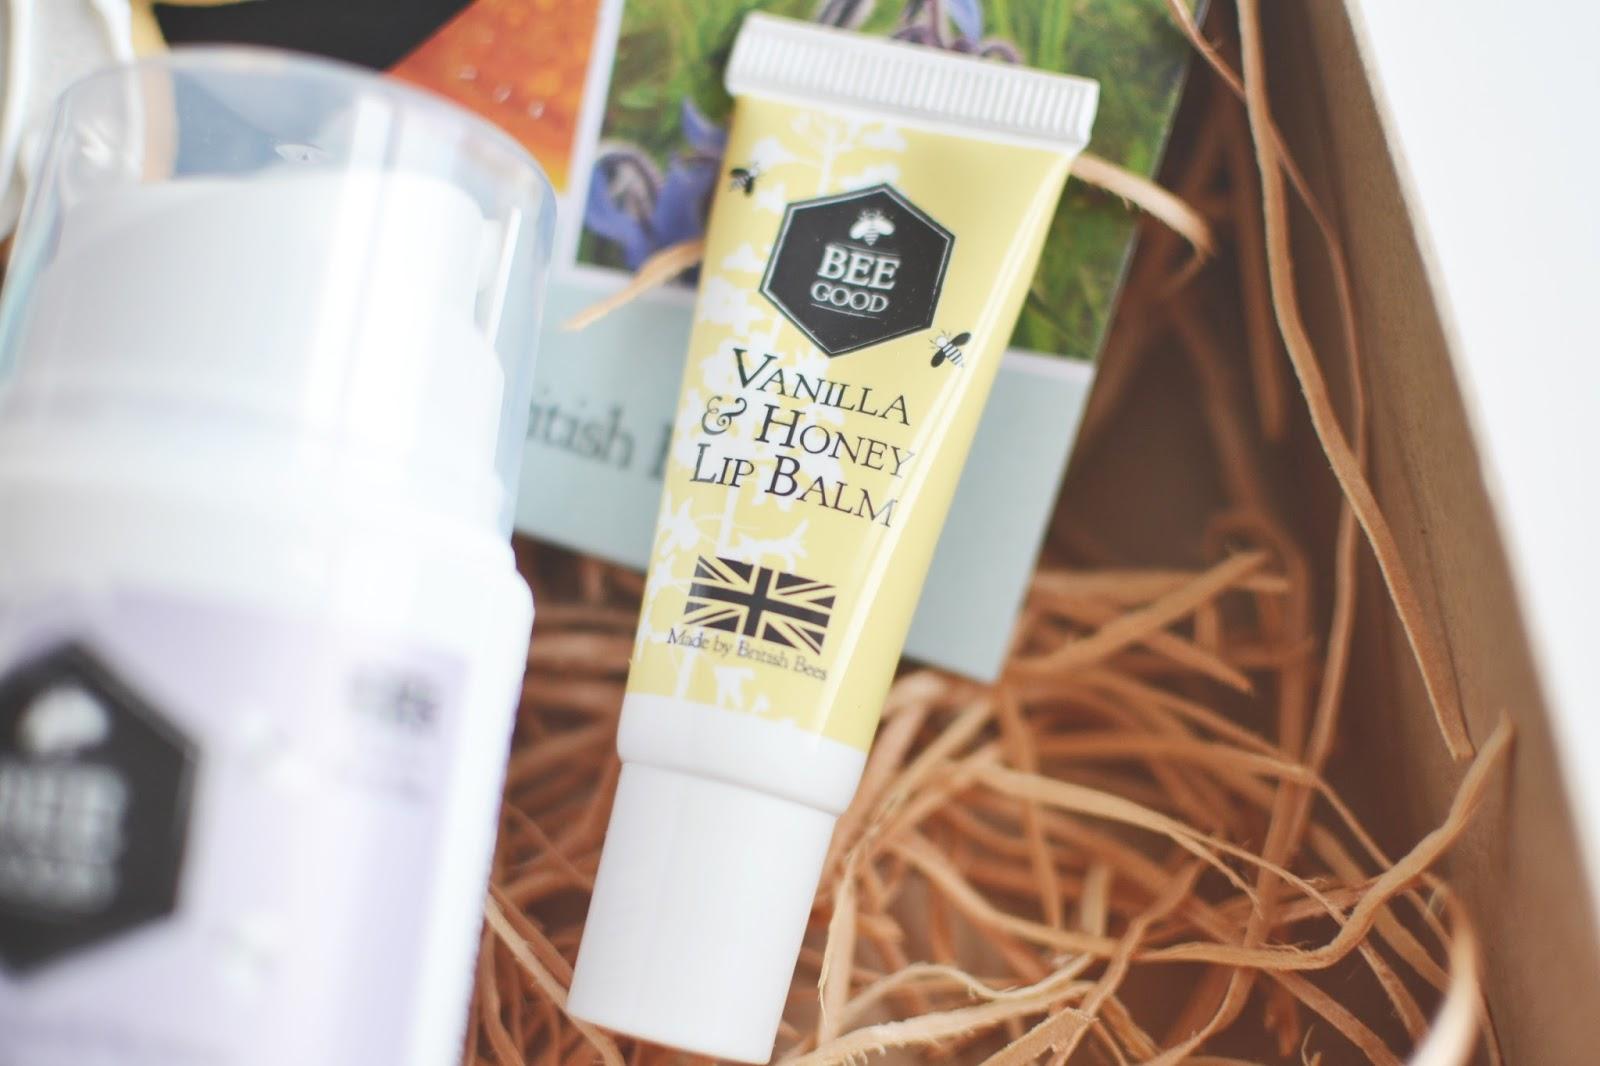 bee good vanilla and honey lip balm